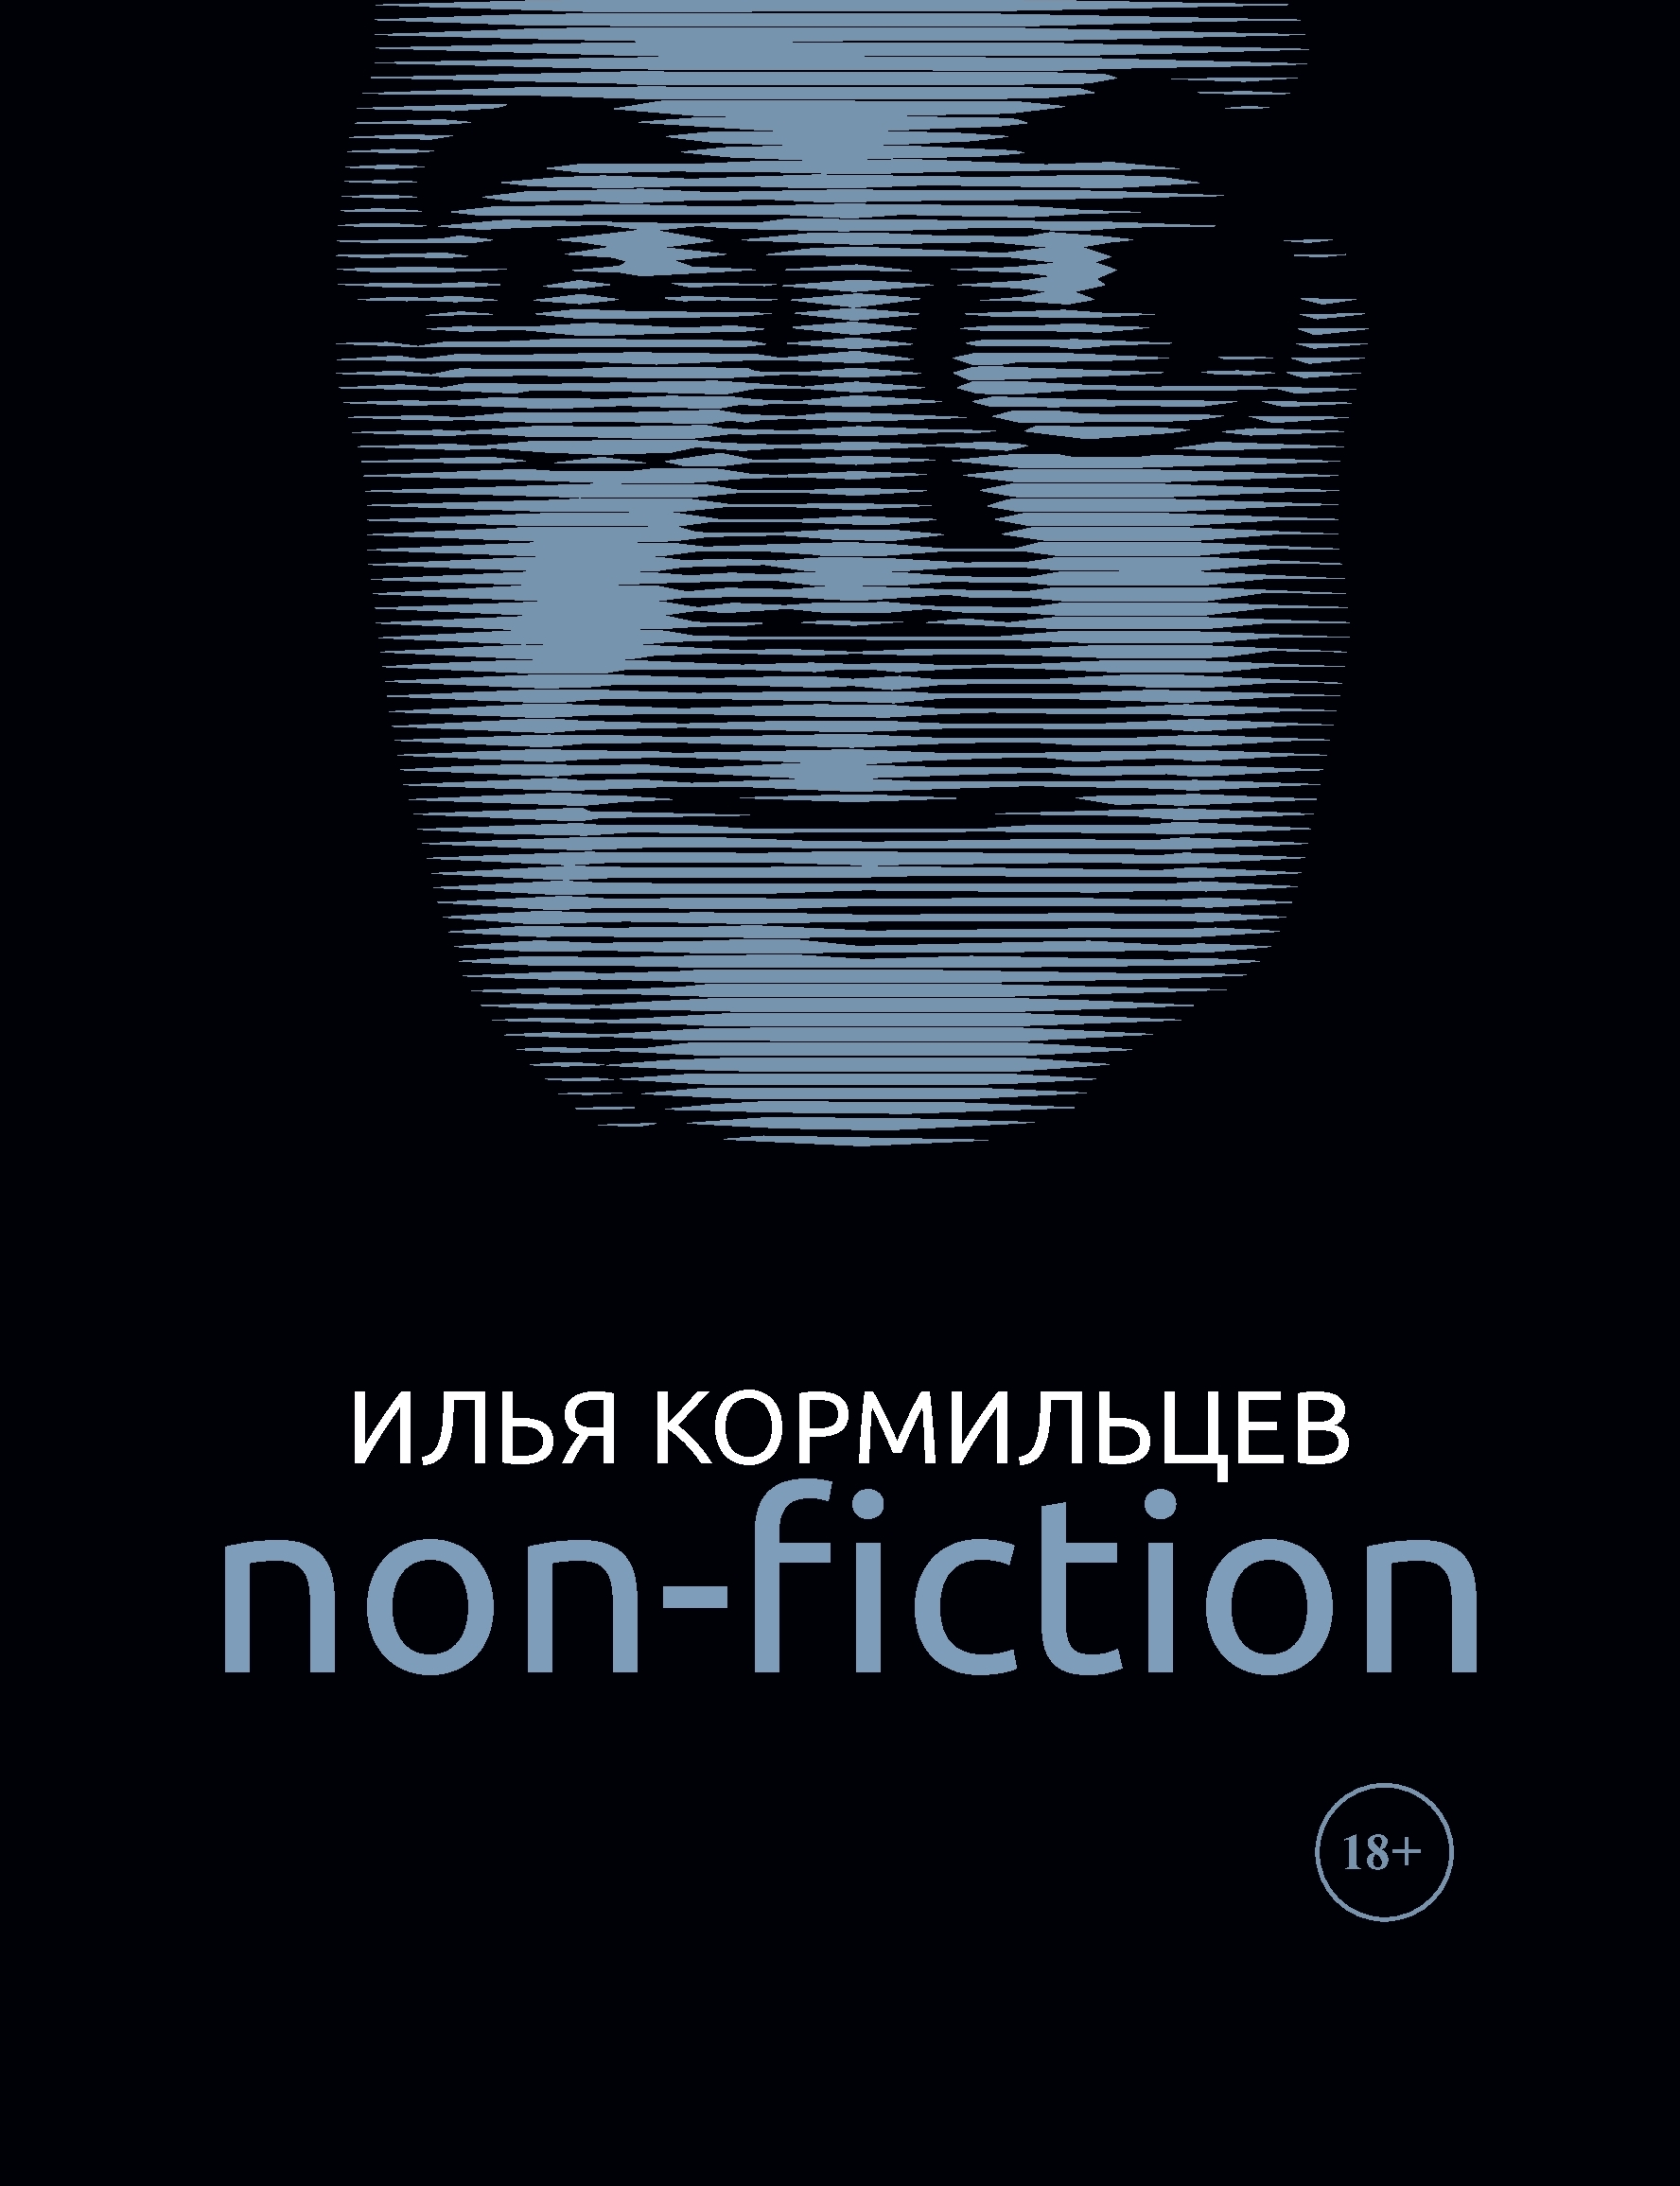 Собрание сочинений. Том 3. Non-fiction